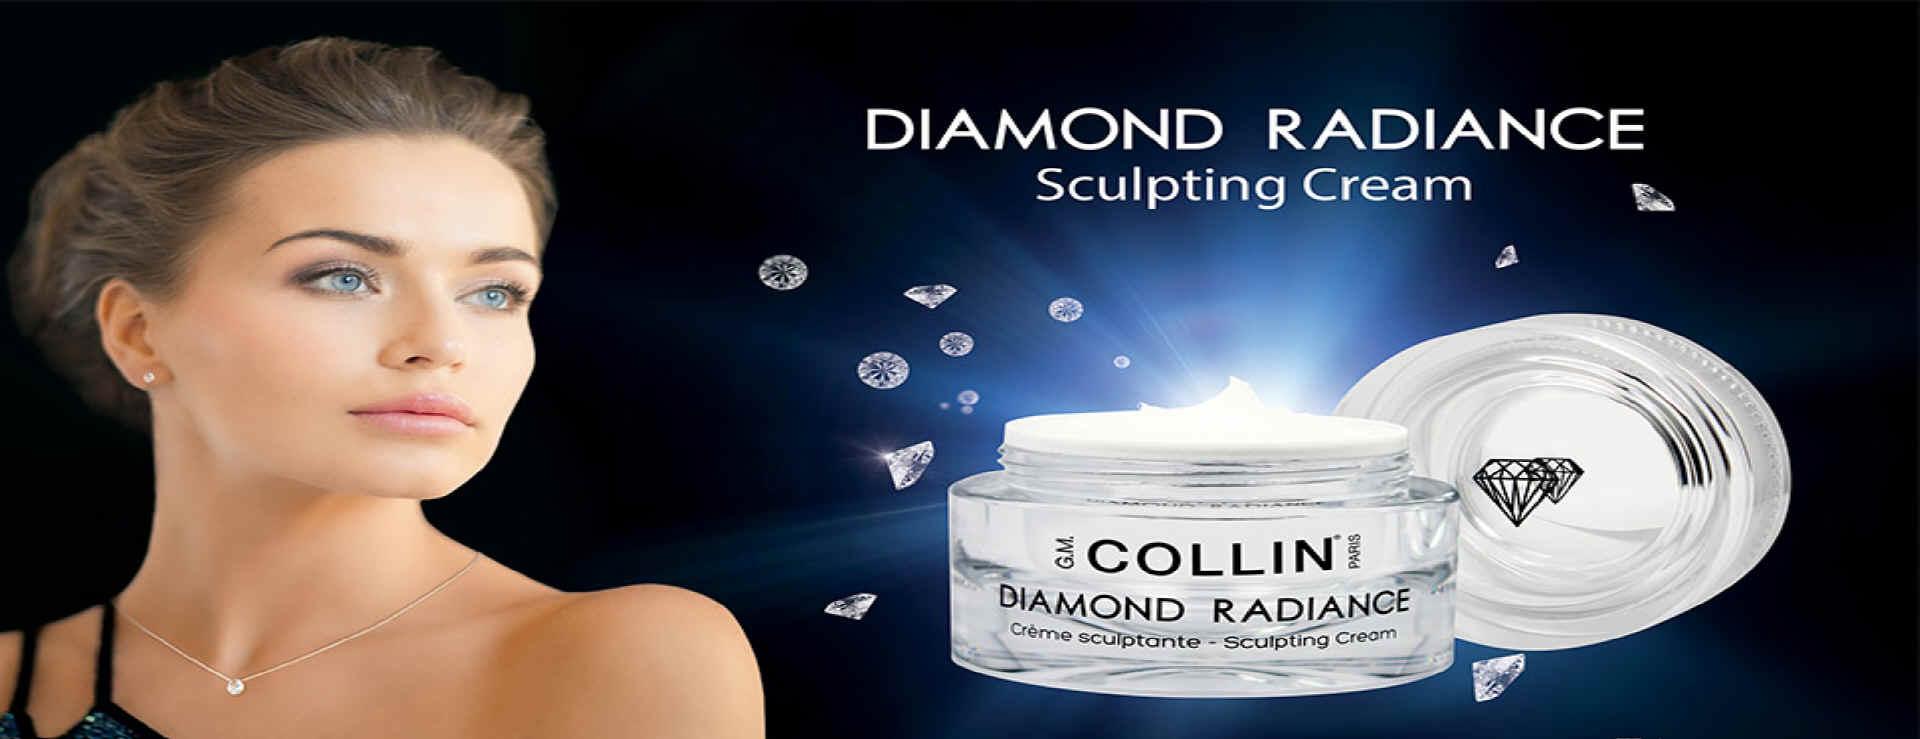 intro-DiamondRadiance-EN_1